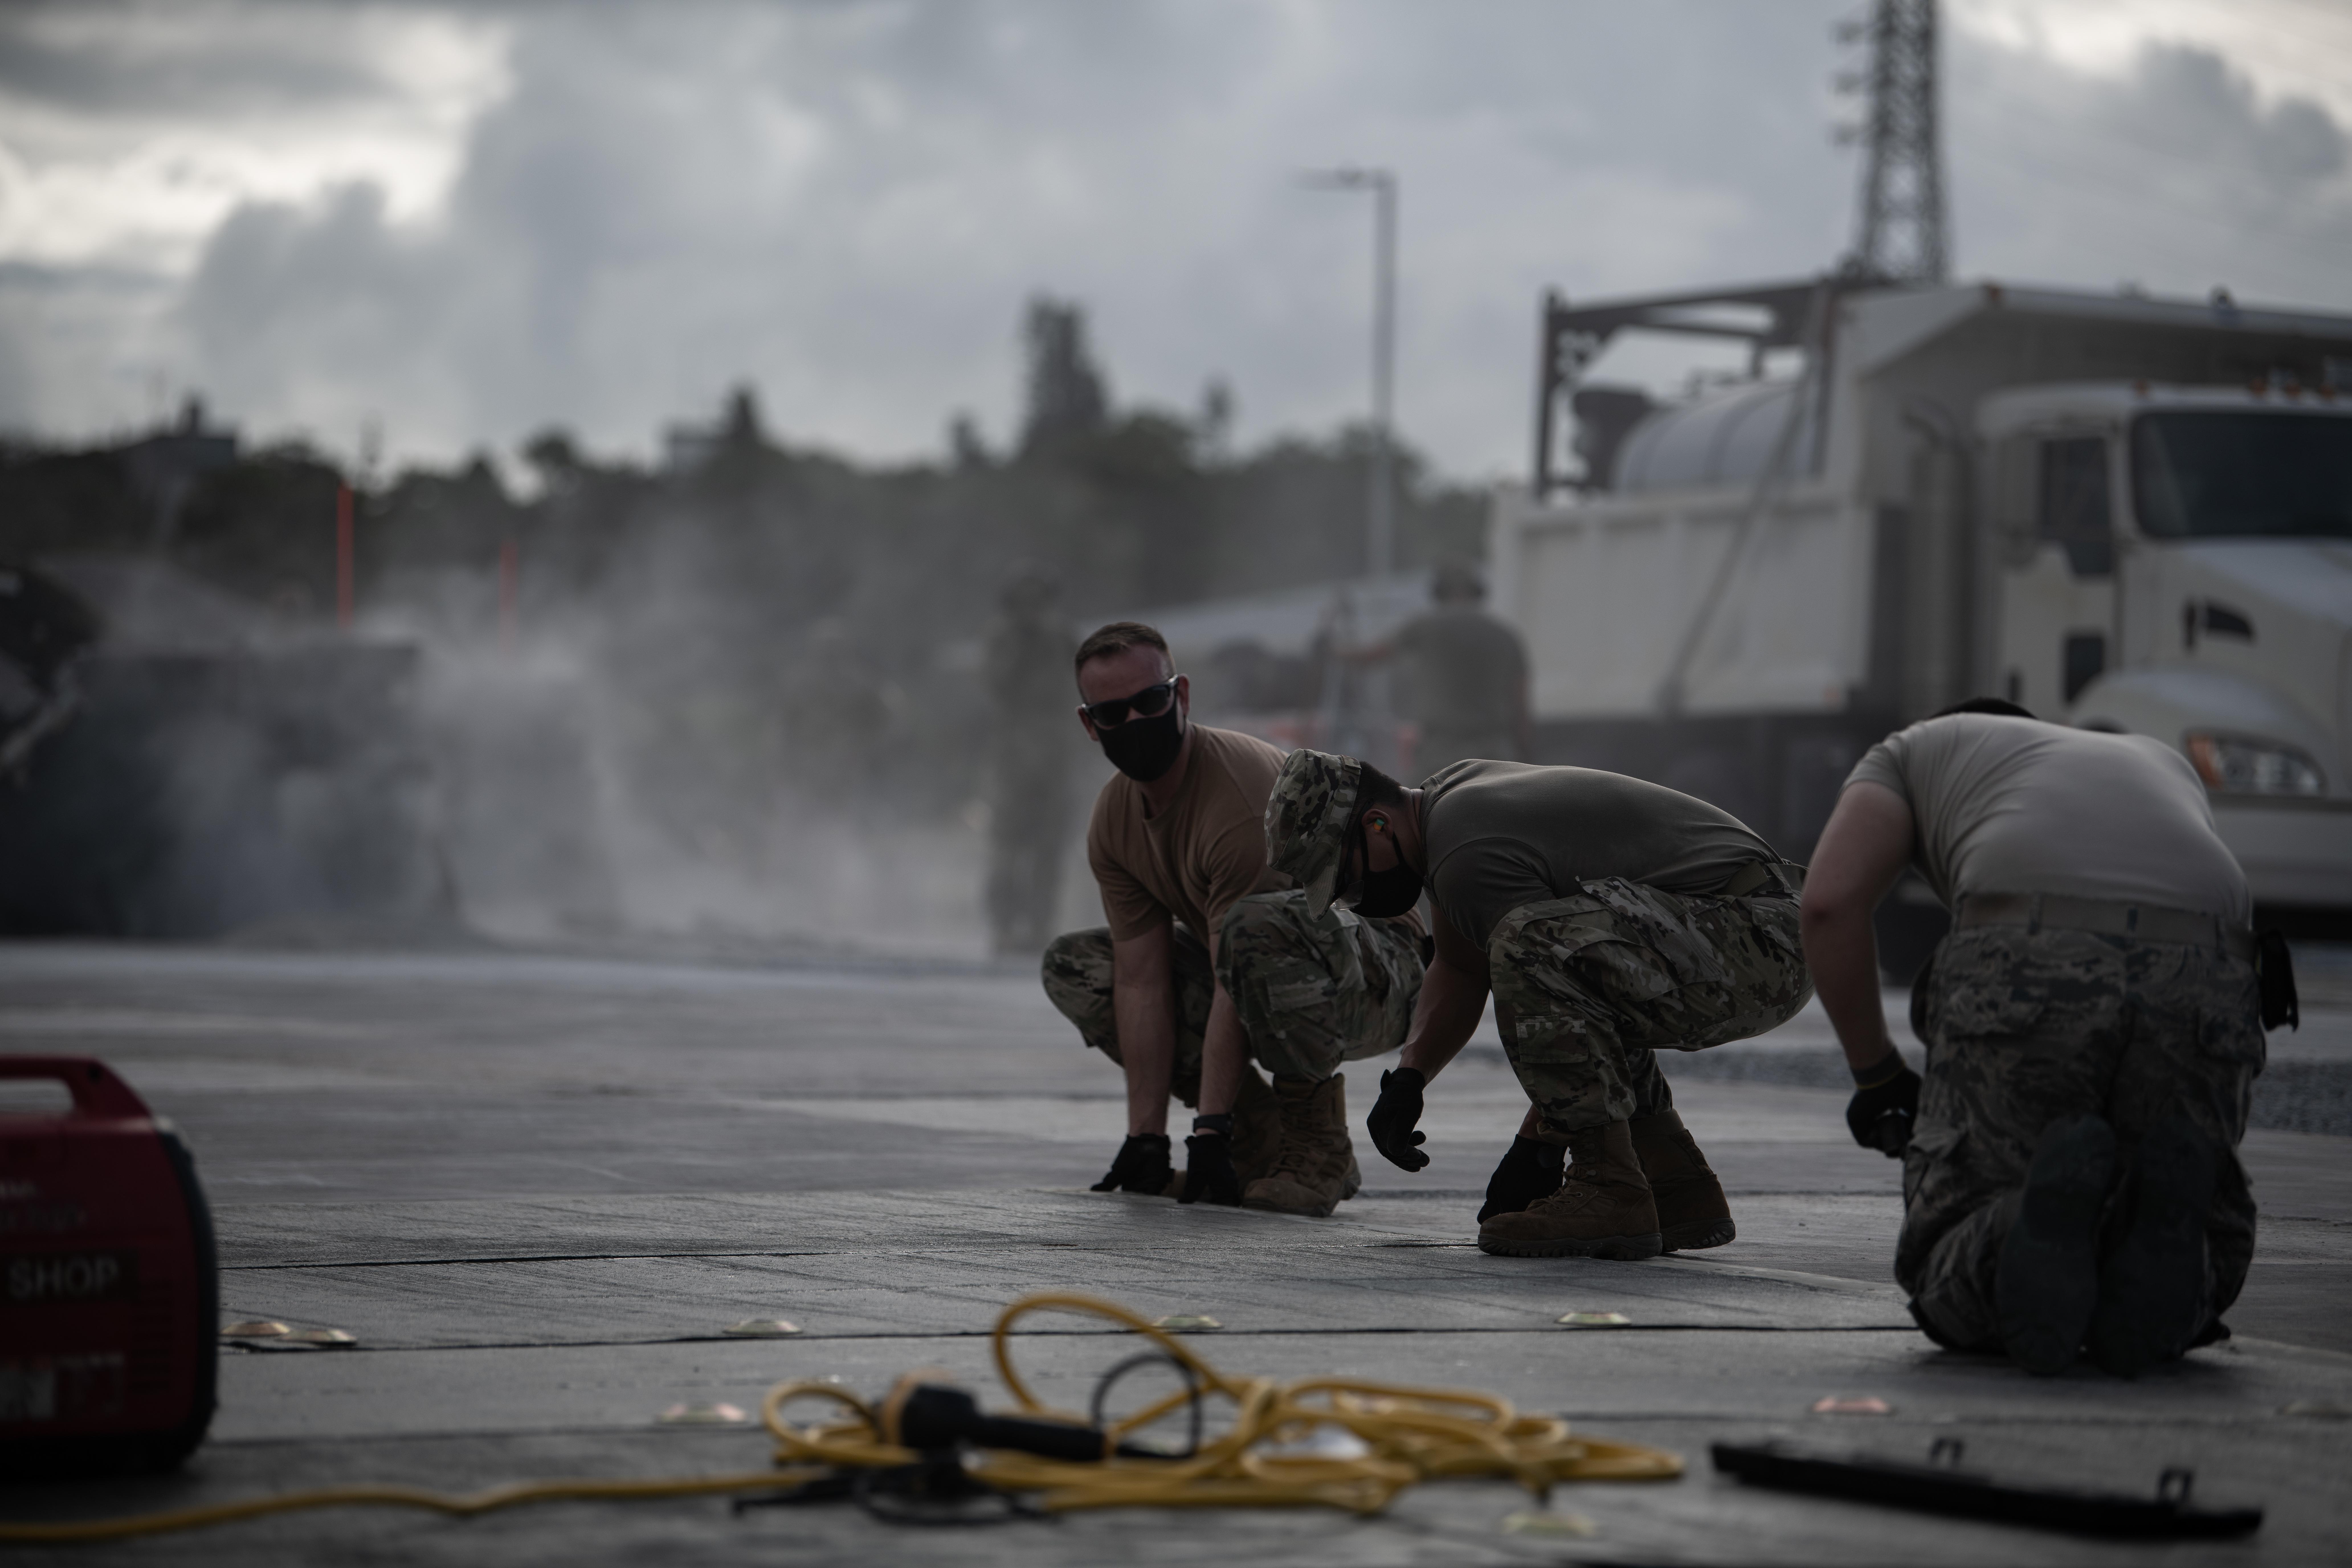 U.S. Air Force Tech. Sgt. William Blevins positions a mat of fiber-reinforced polymer to repair airfield damage during Valiant Shield 2020 at Kadena Air Base, Japan, on Sept. 22, 2020. (Tech. Sgt. Daniel E. Fernandez/U.S. Air Force)